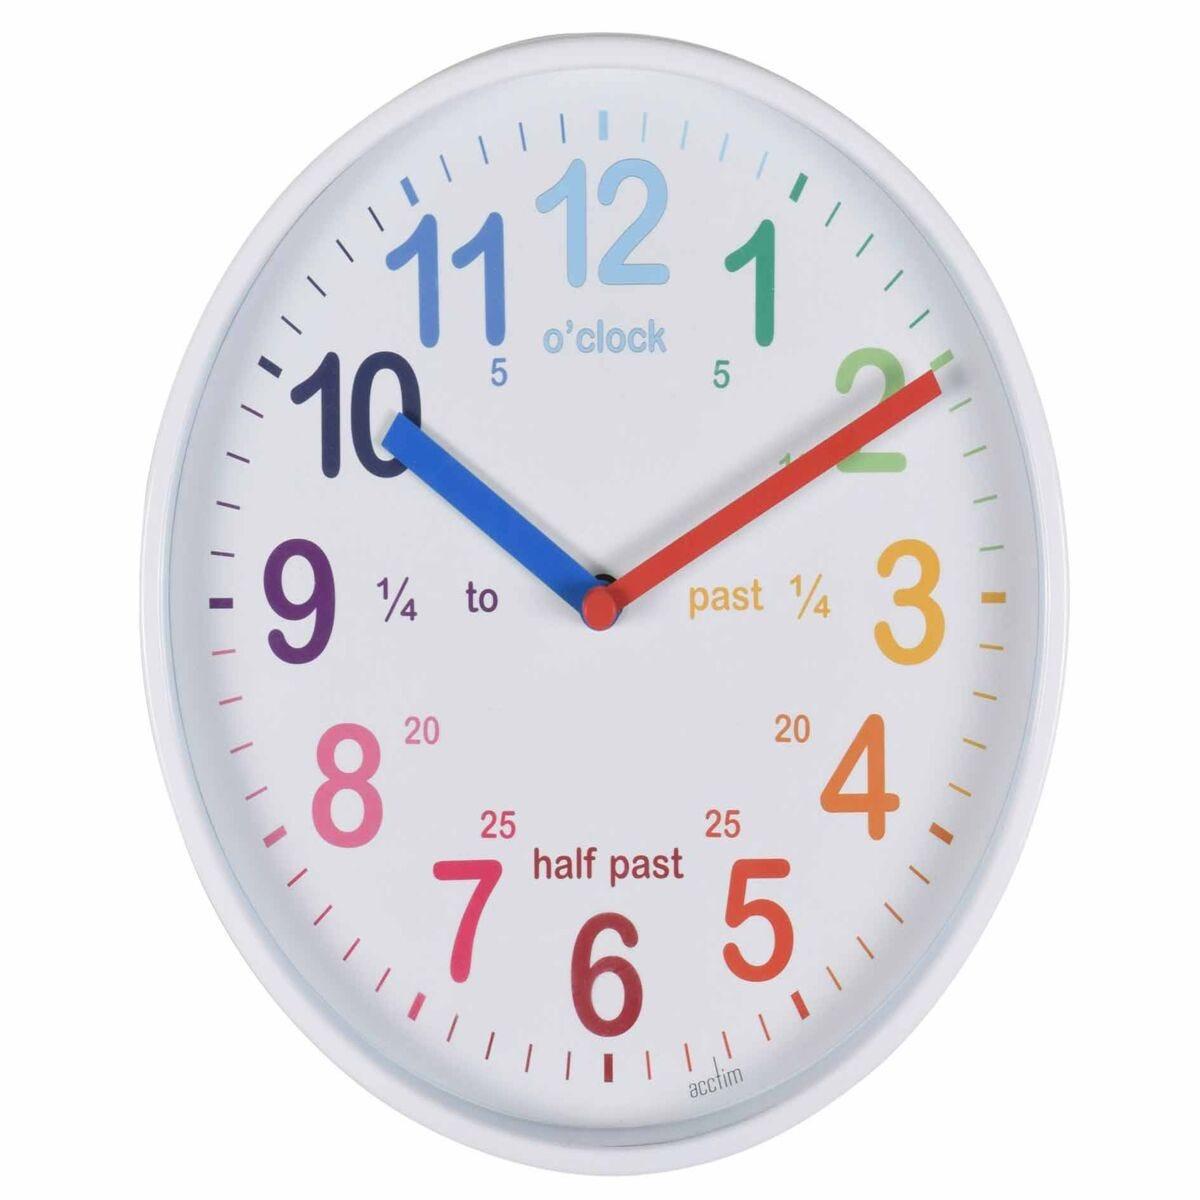 Acctim Wickford Time Teaching Wall Clock